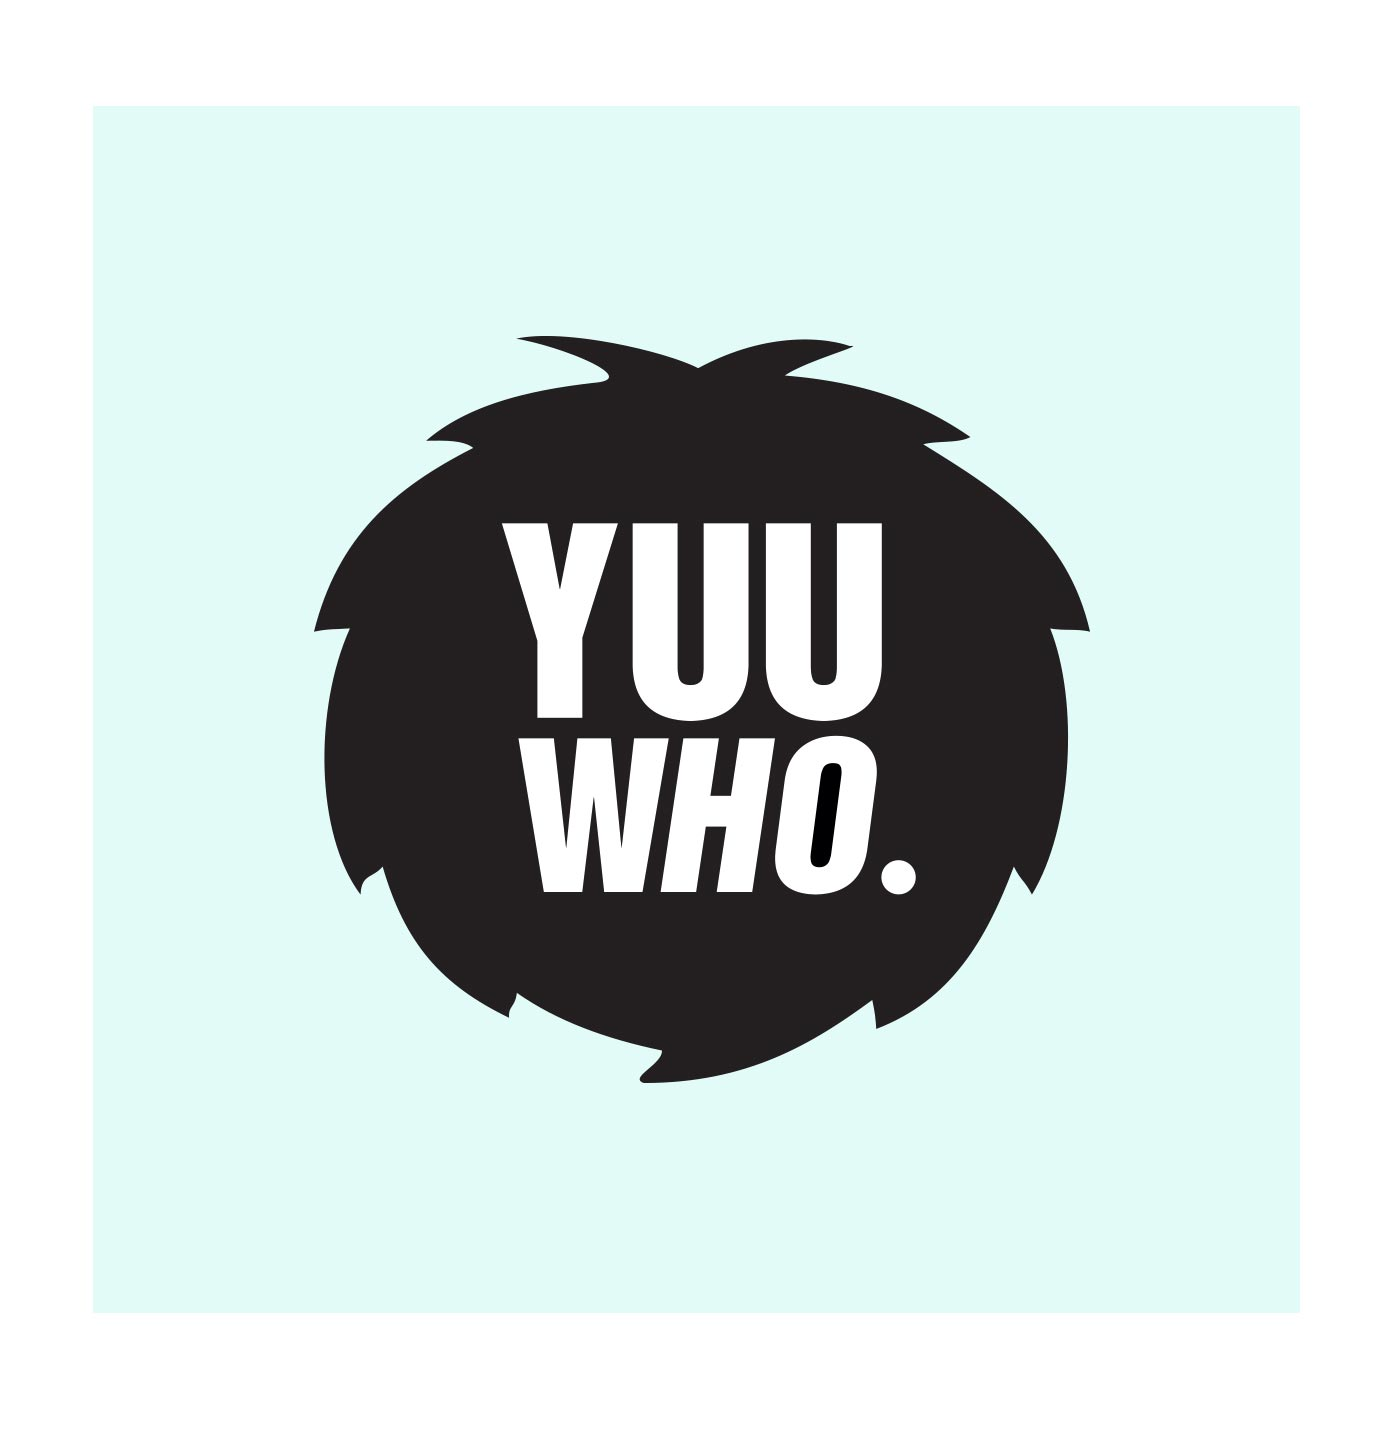 yuuwho_logo